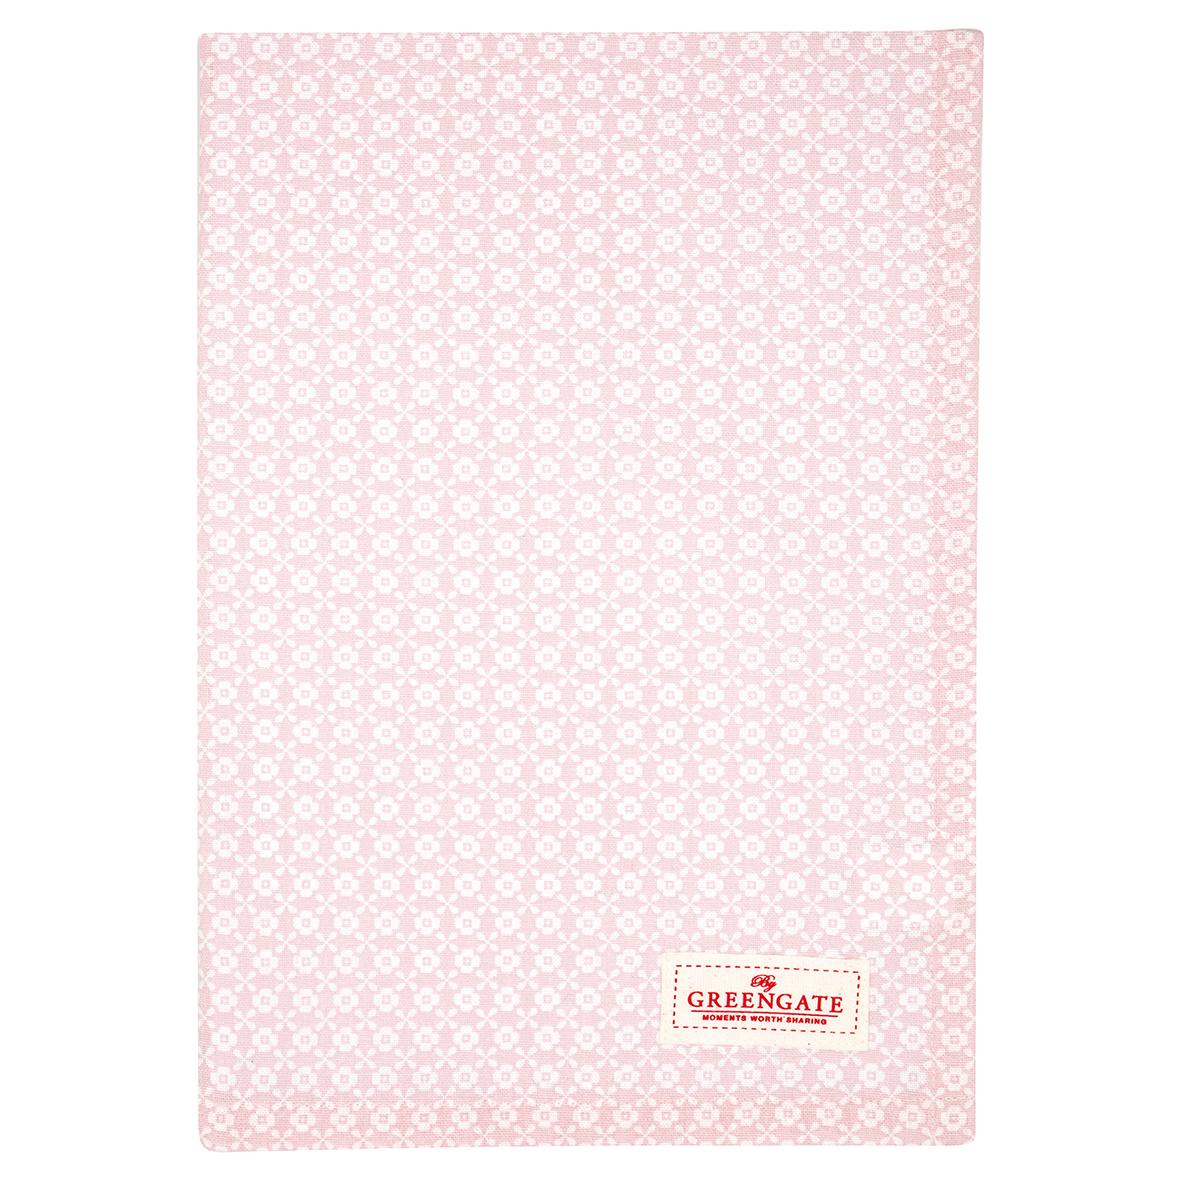 GreenGate Geschirrhandtuch Helle Pale Pink